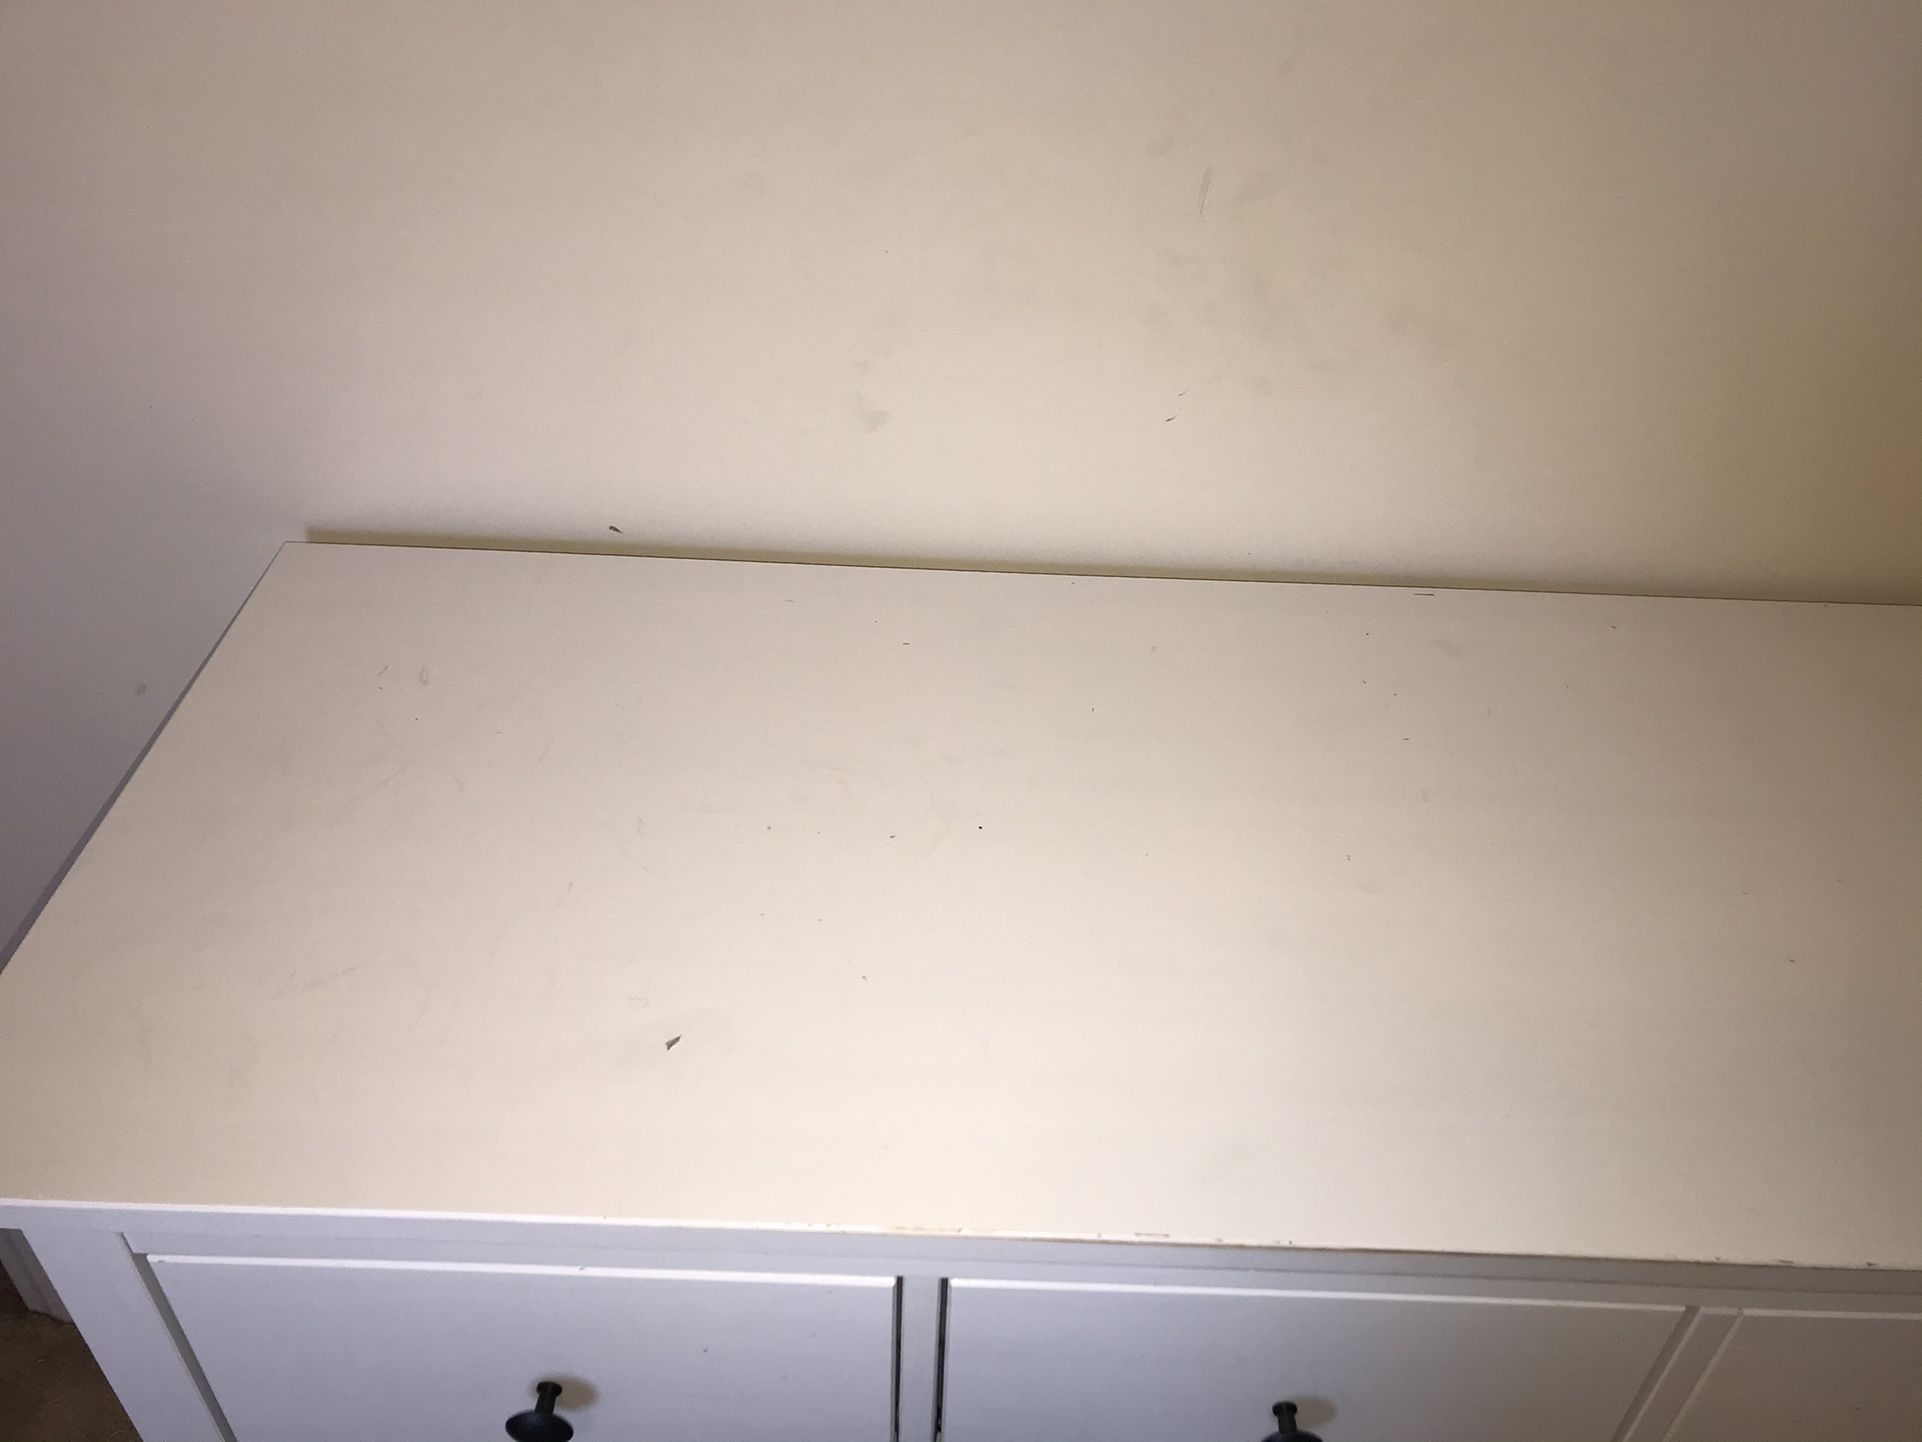 Ikea 8 drawer Dresser